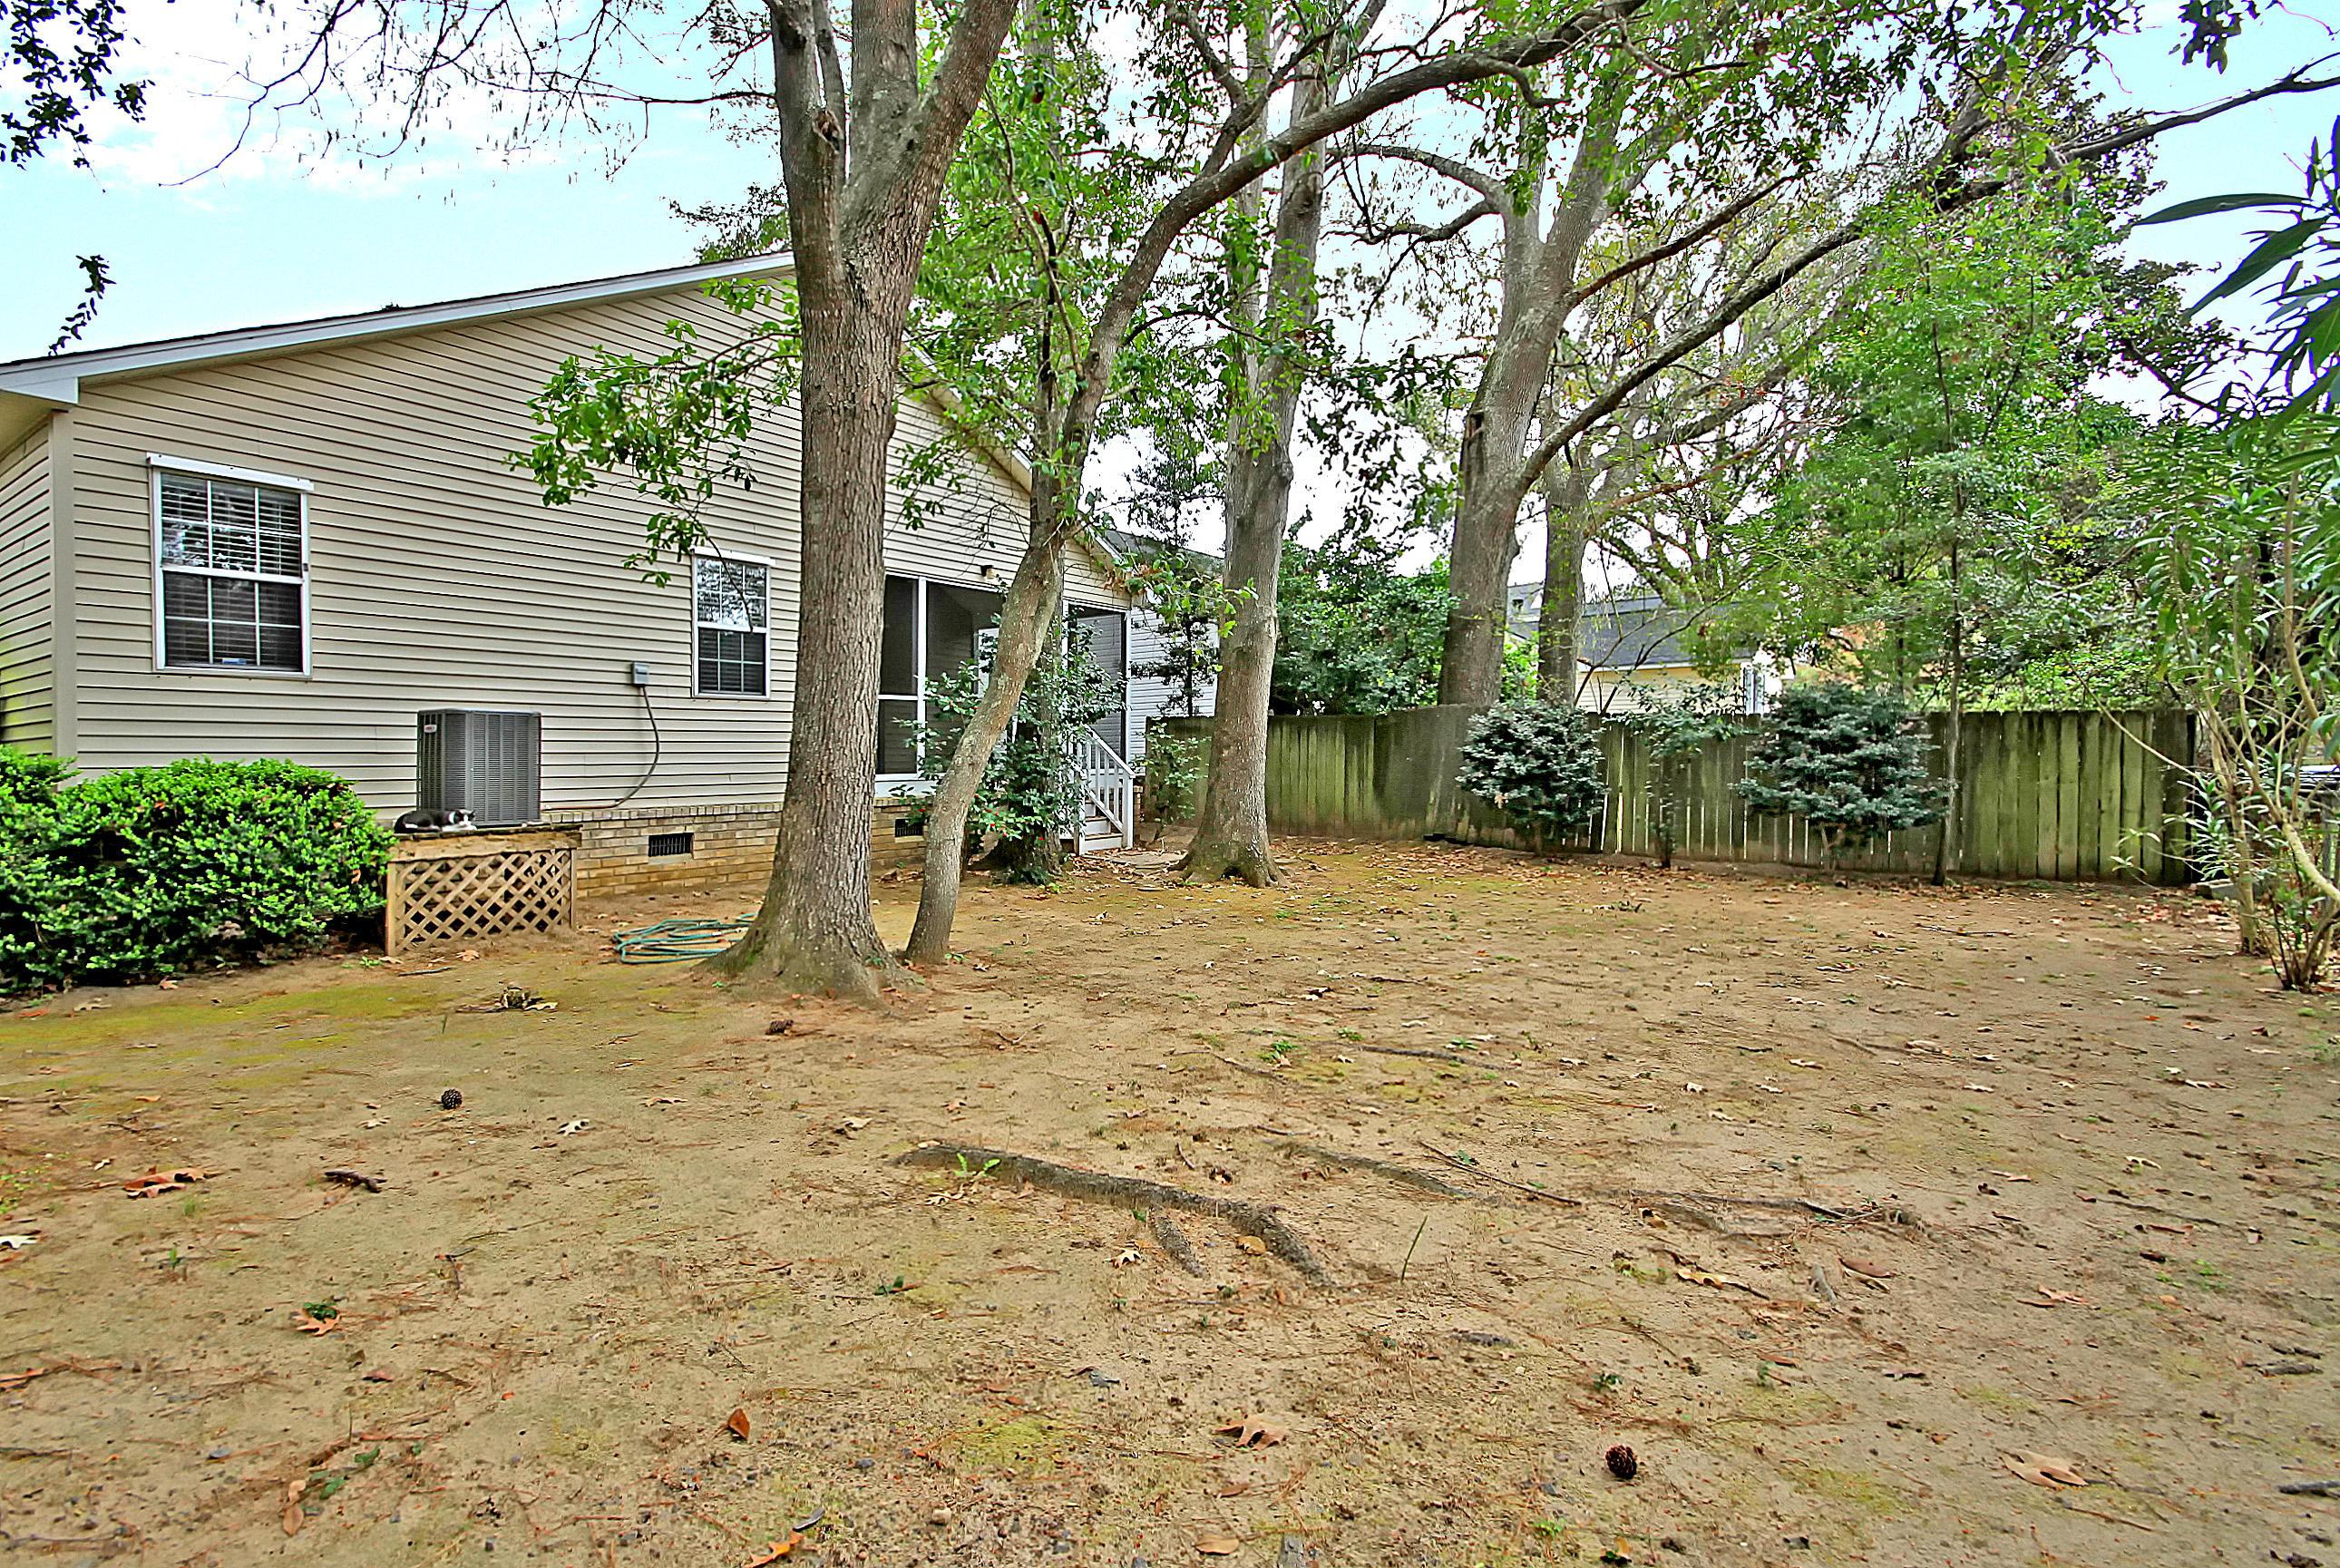 Harbor Place Homes For Sale - 845 Harbor Pl, Charleston, SC - 20